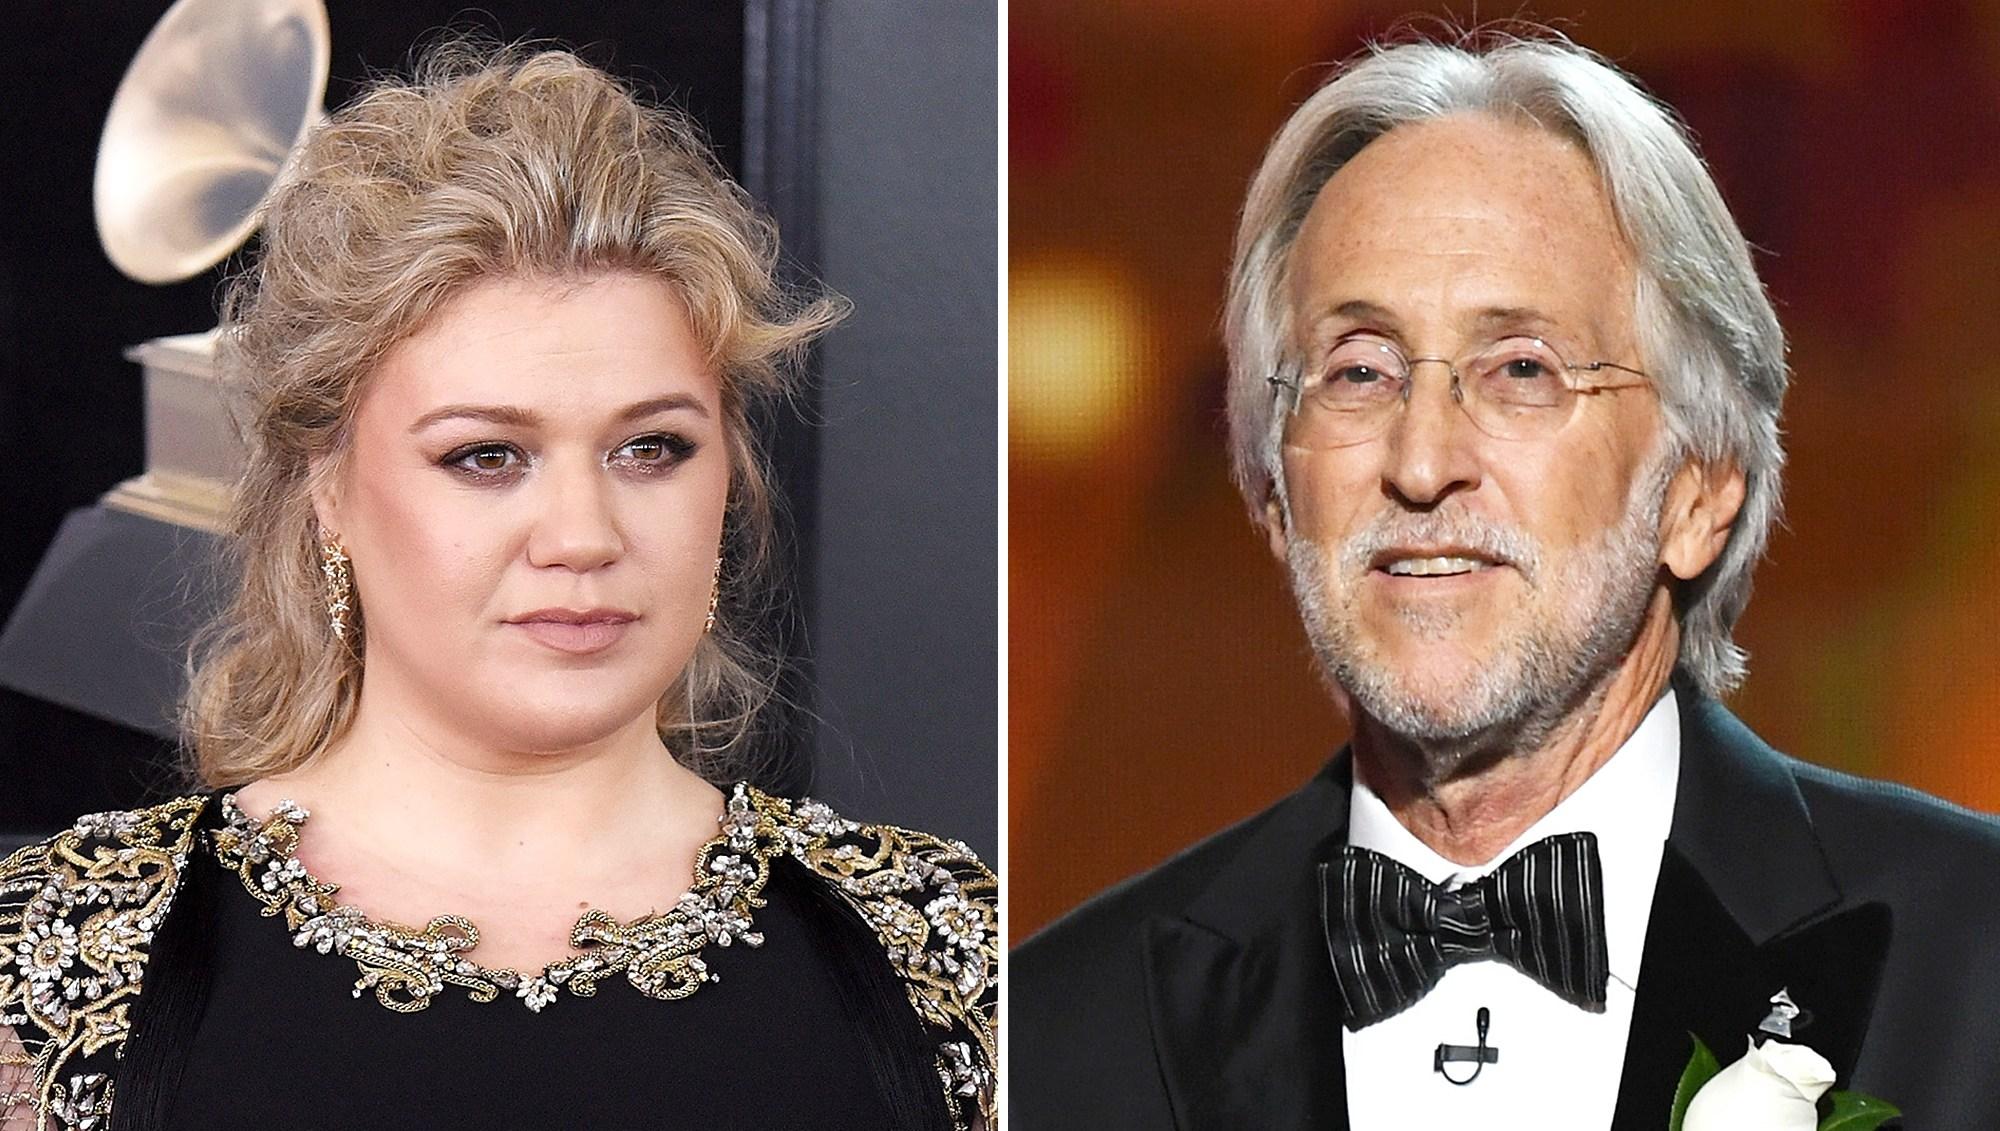 Kelly Clarkson Slams Grammys President Neil Portnow